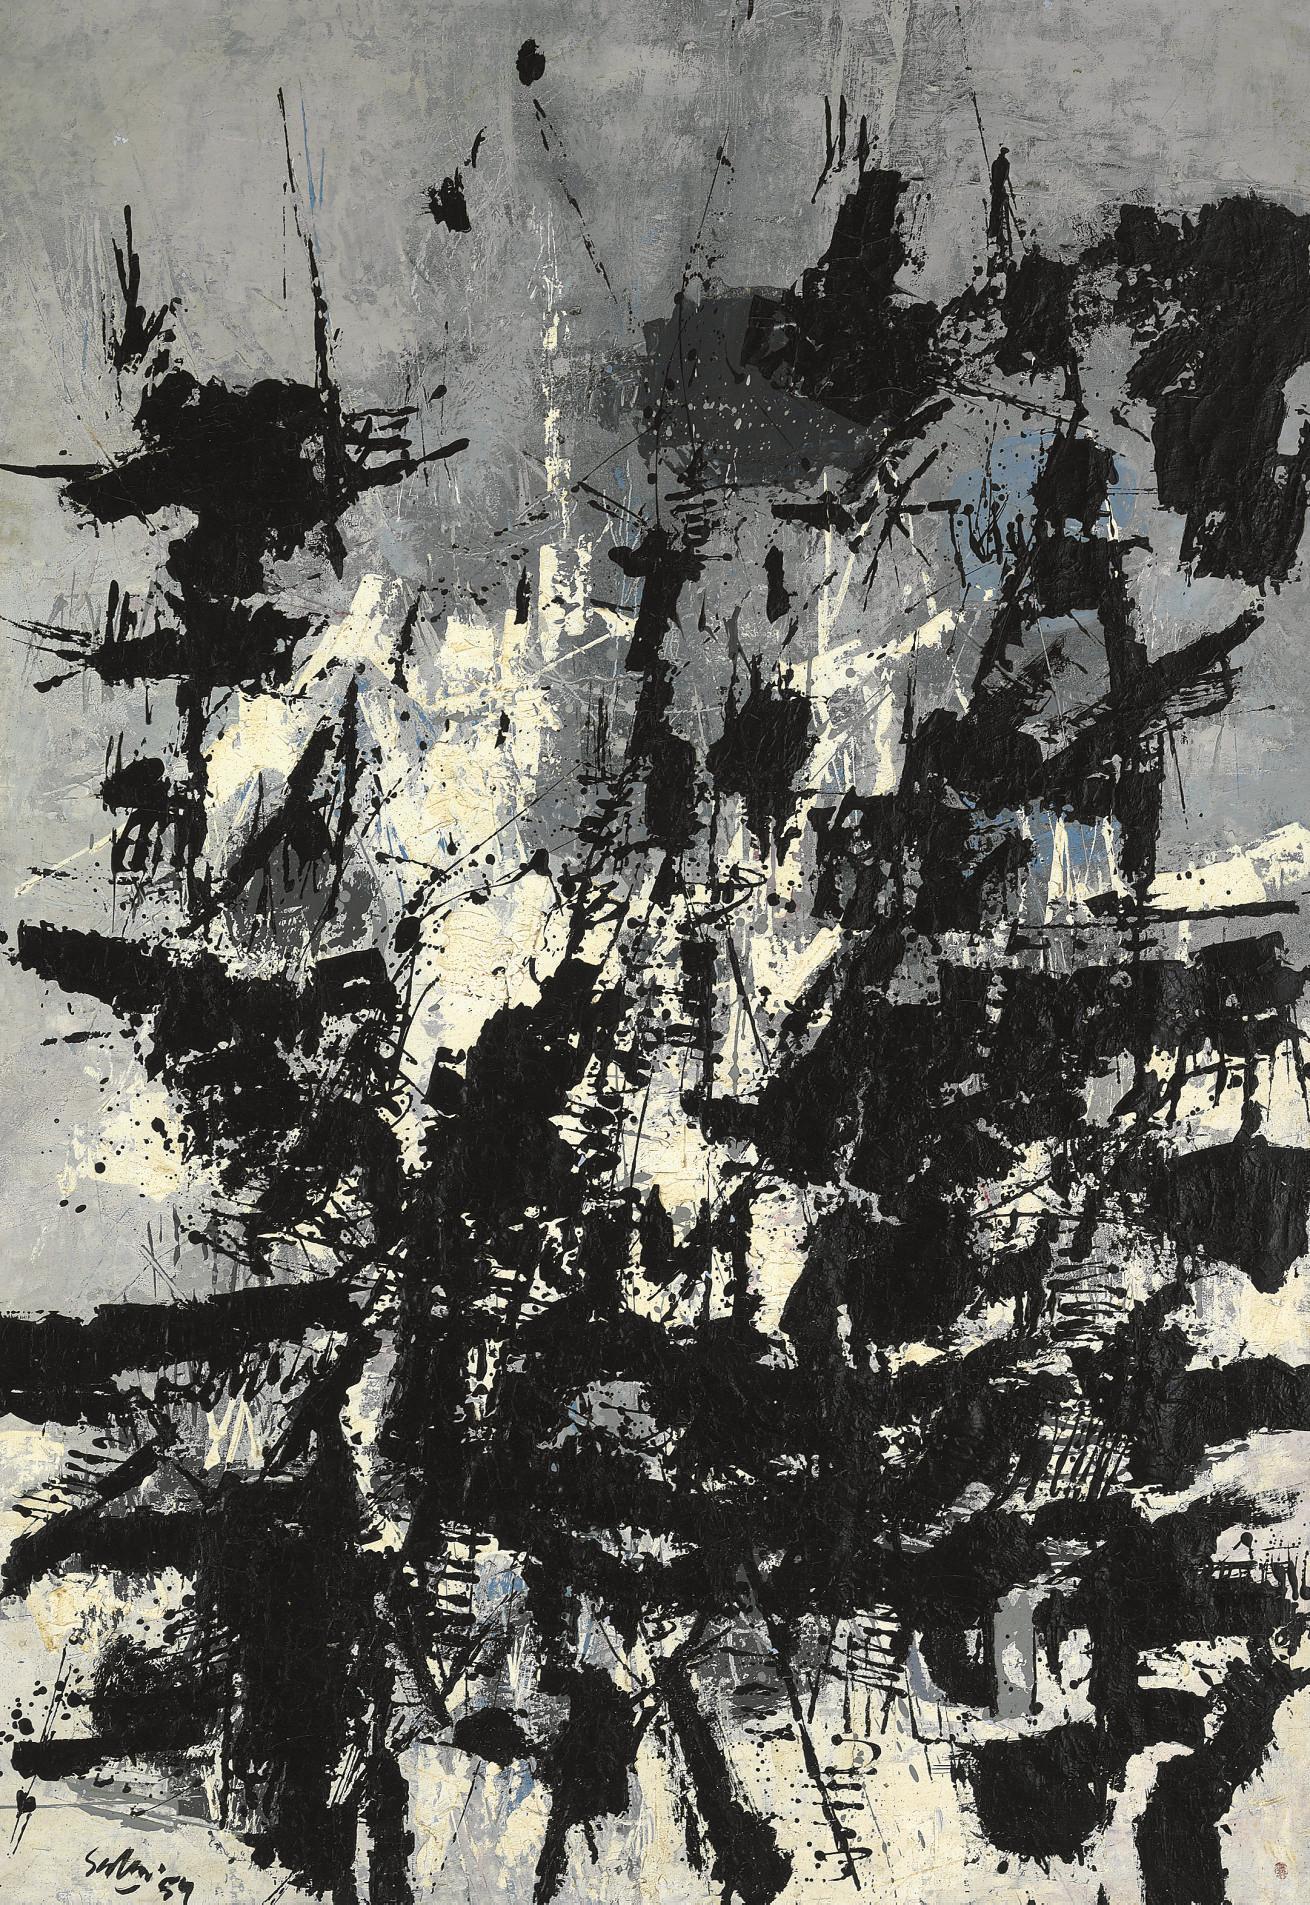 Untitled (No. 1)